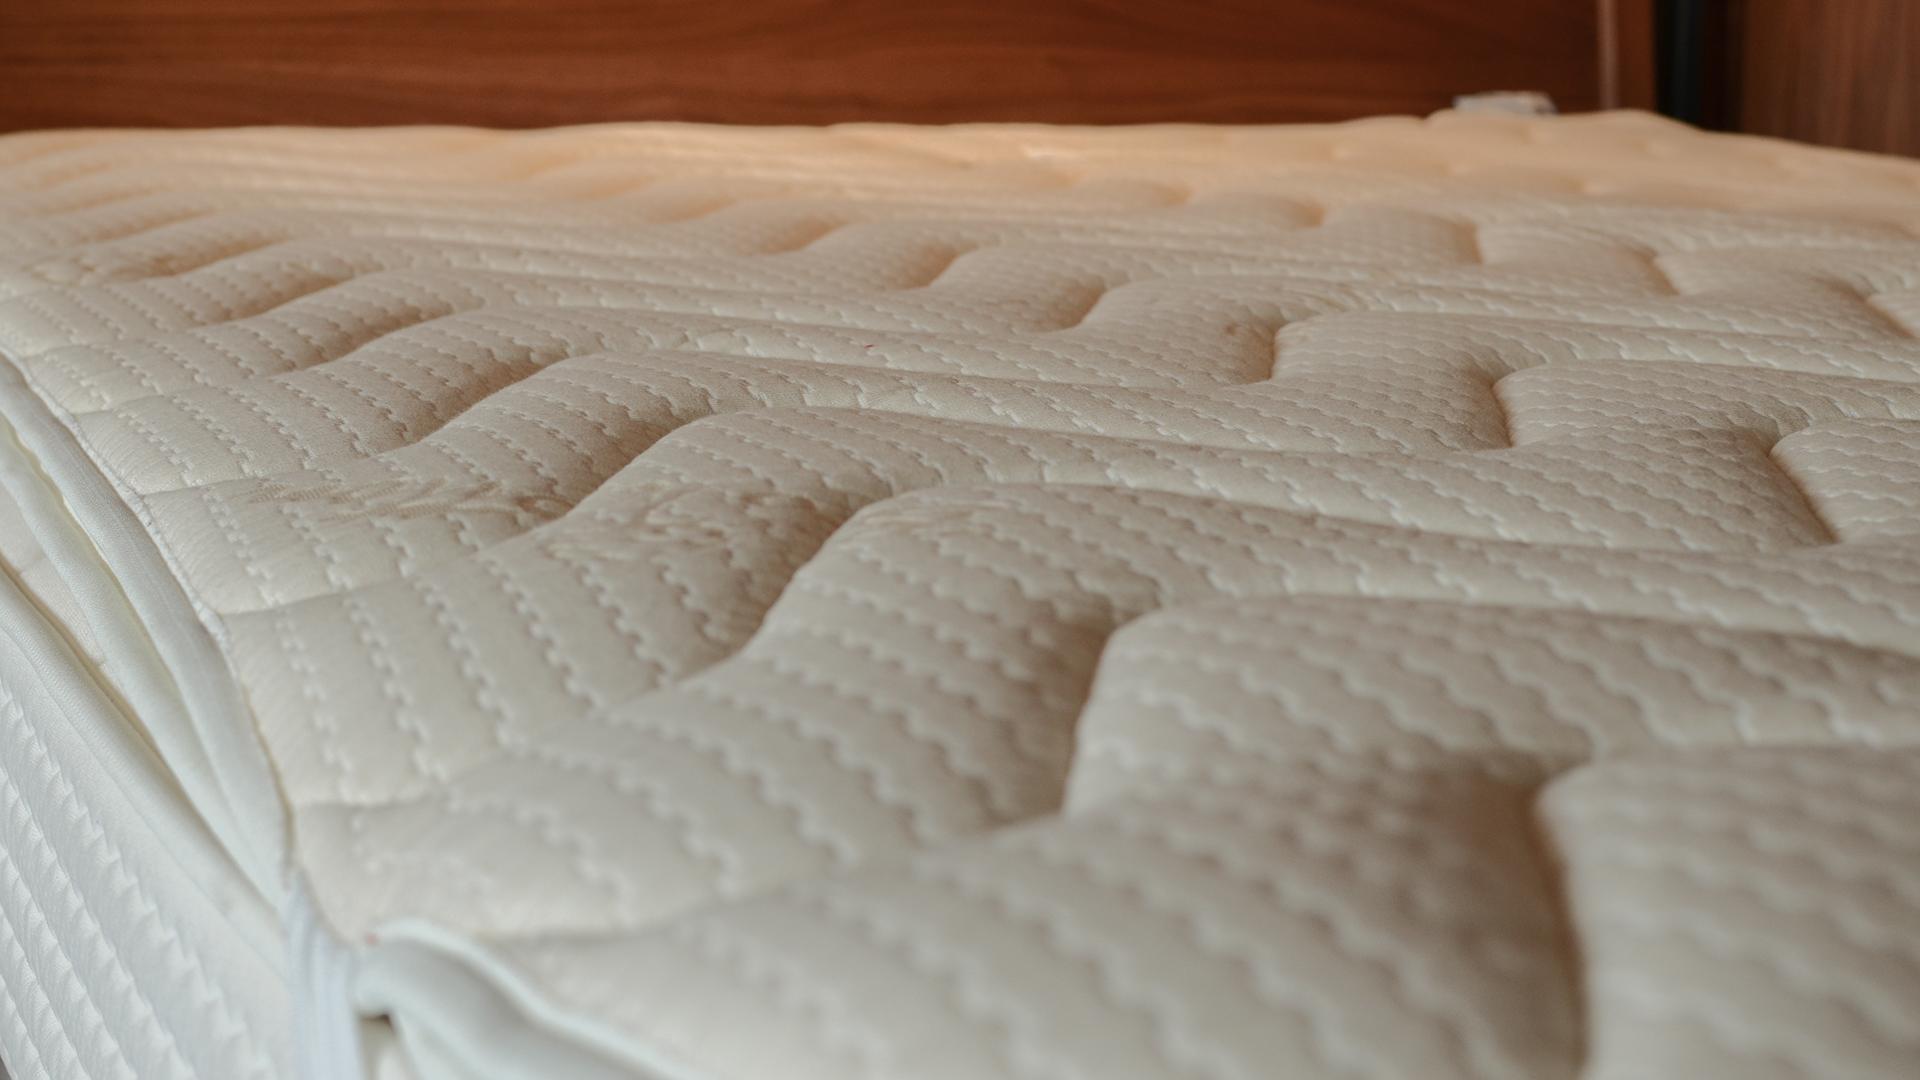 organic cotton & wool dual side mattress topper - cotton side